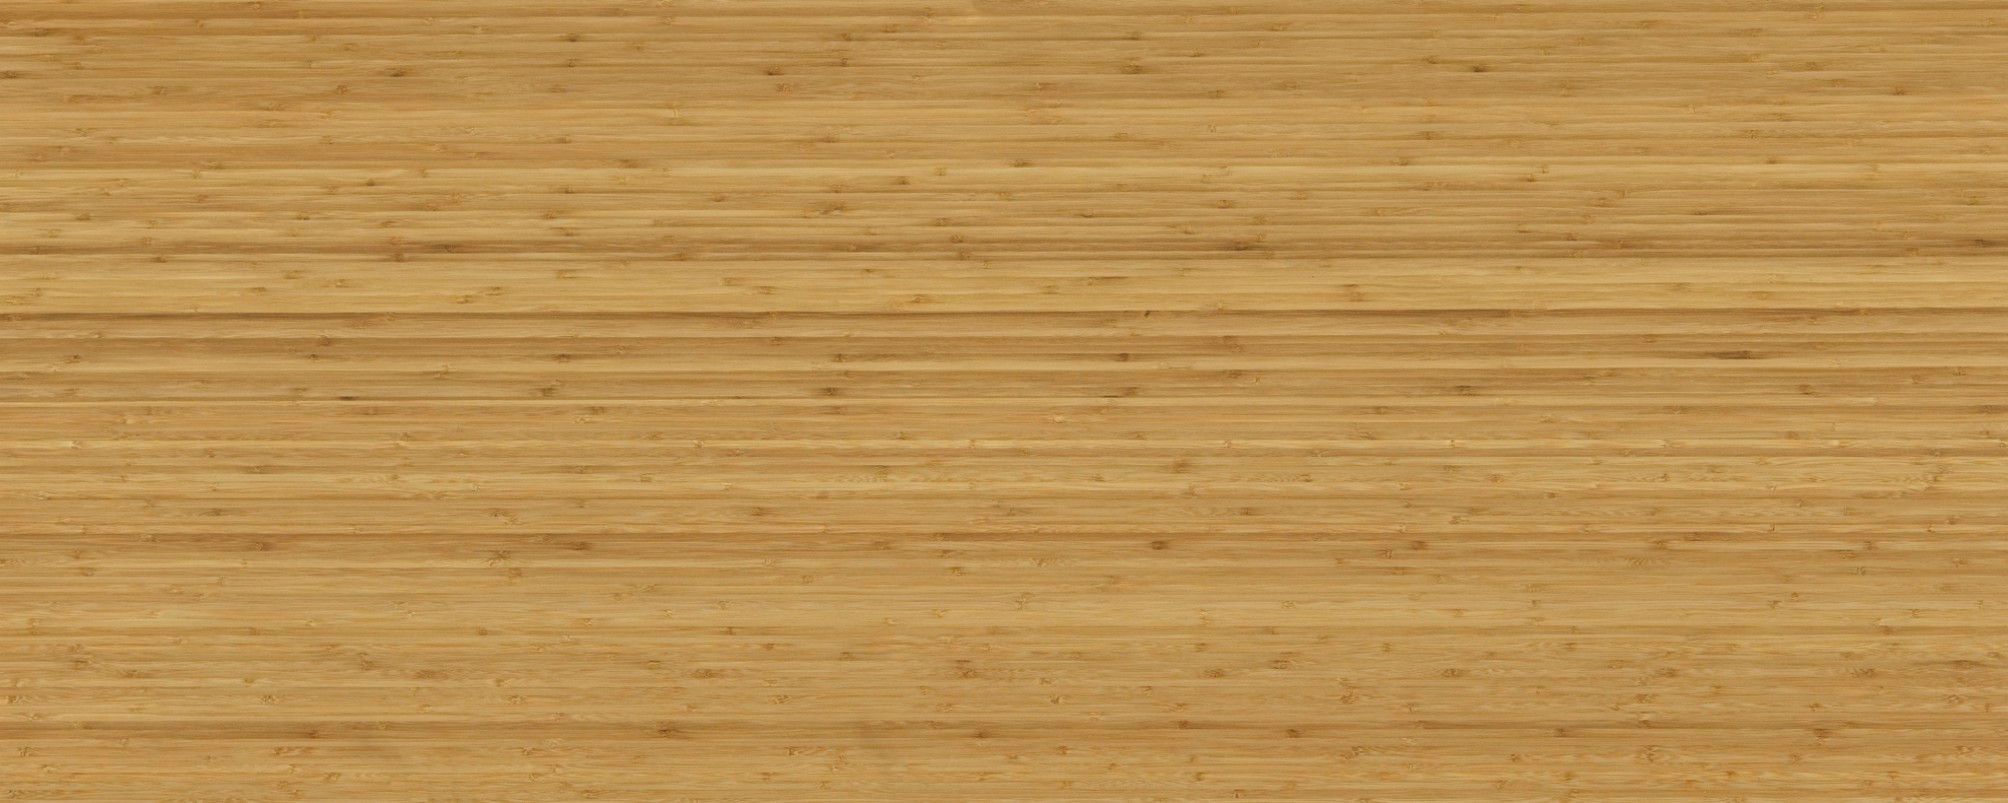 ON35 bambus carmel